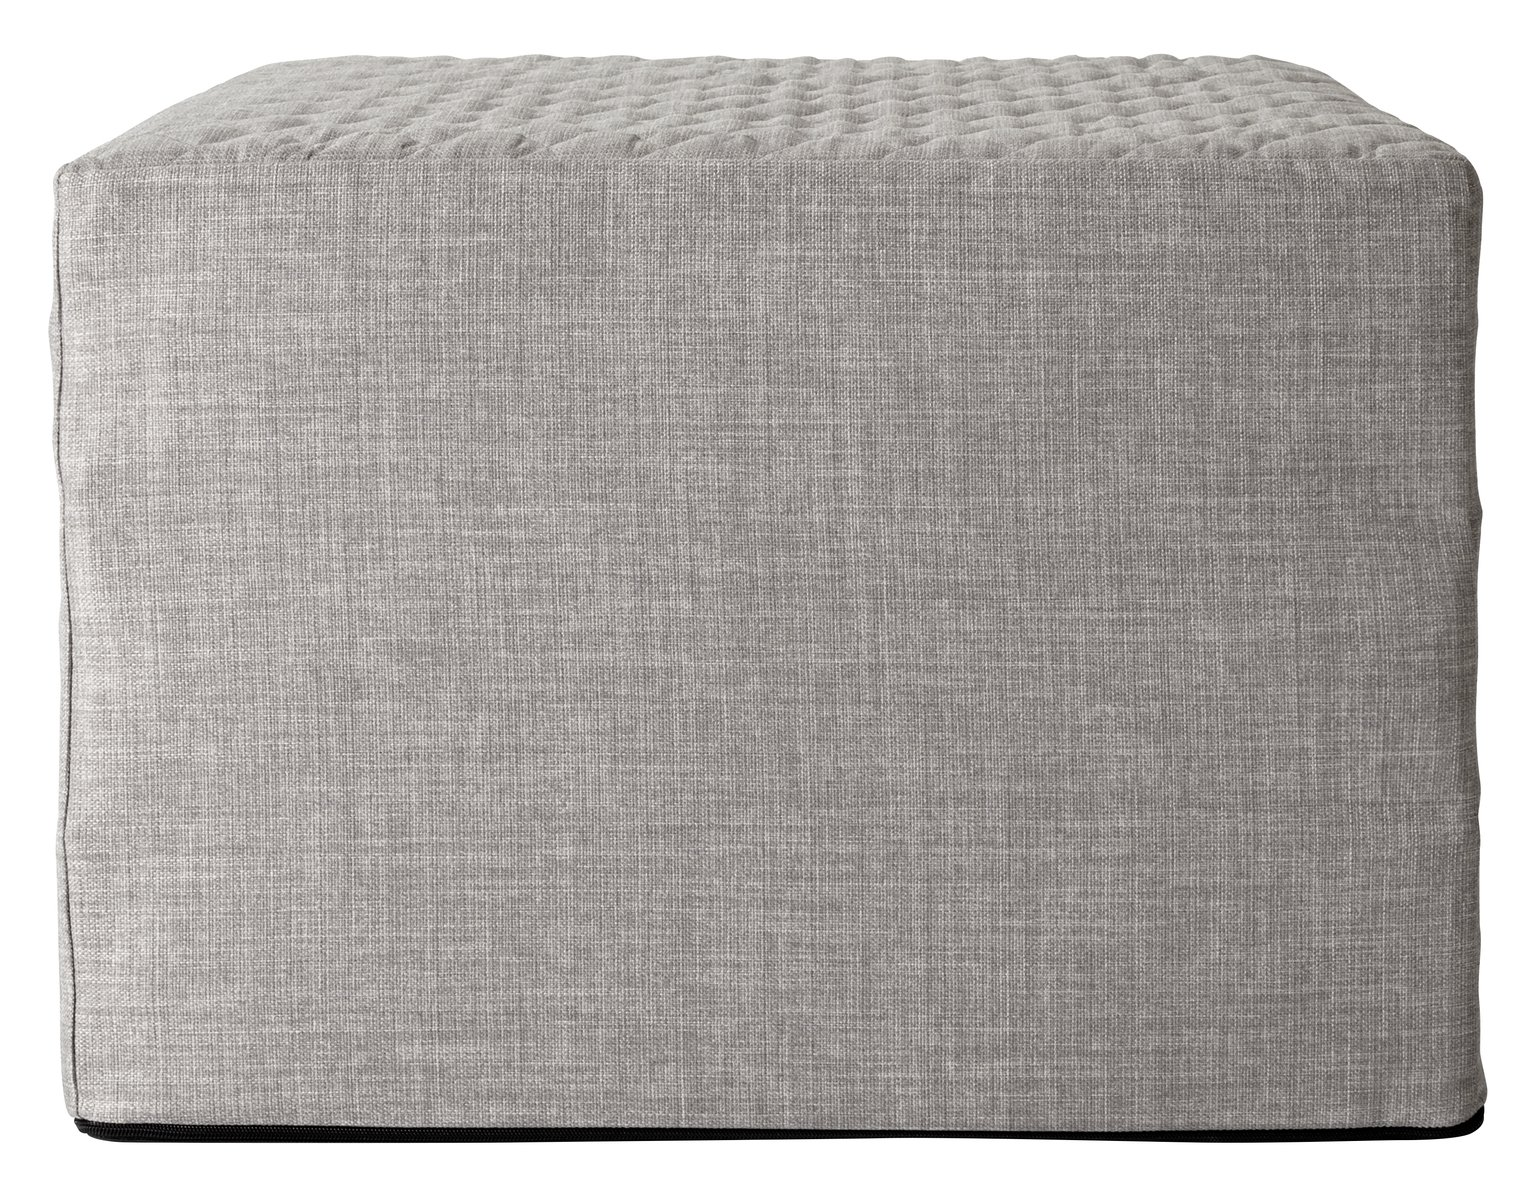 Argos Home Prim Fabric Single Ottoman Bed - Light Grey